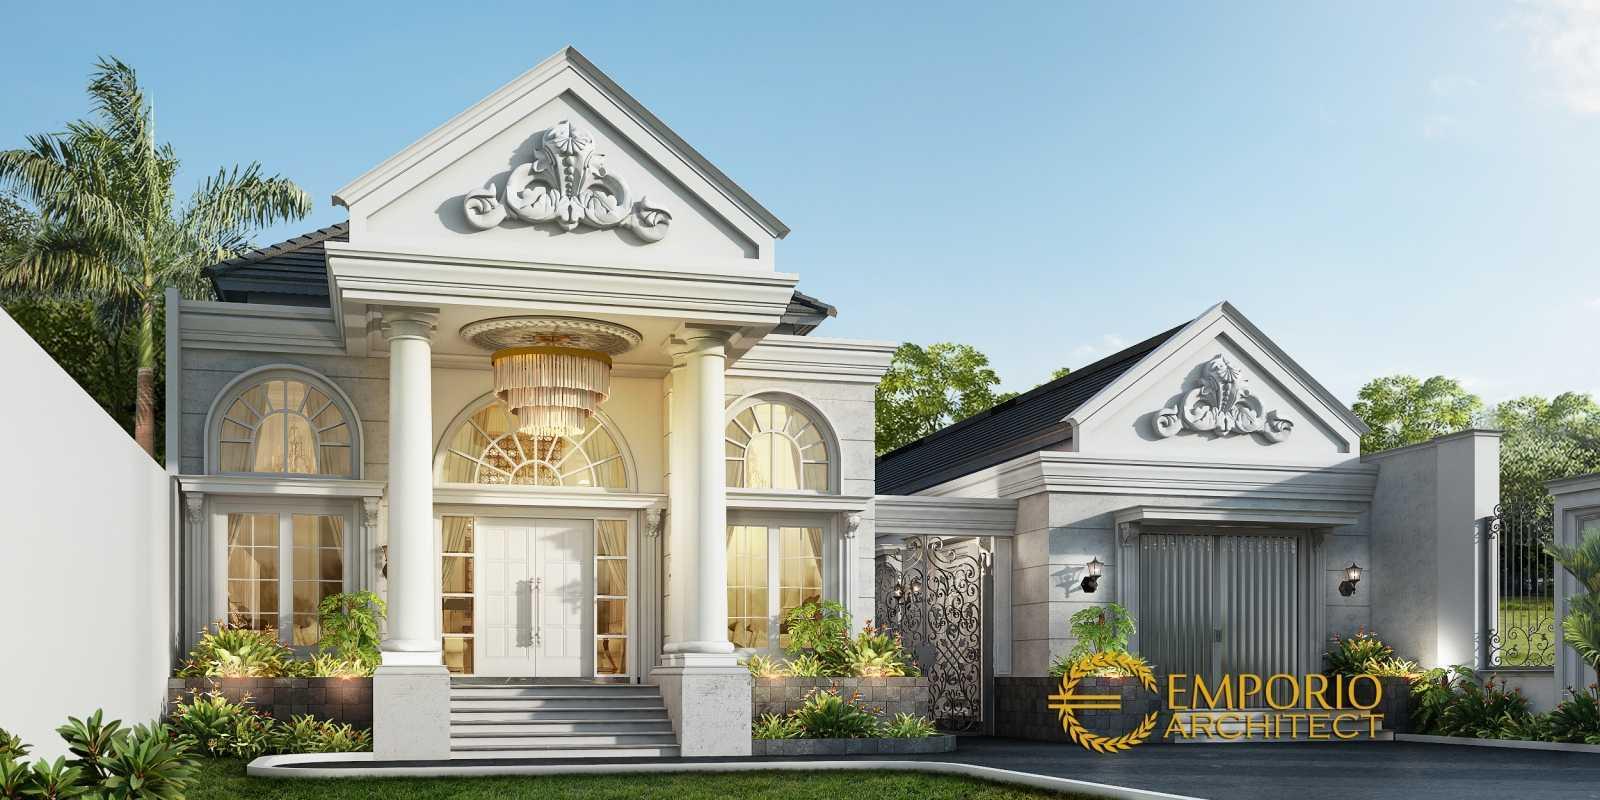 Jasa Arsitek Emporio Architect di Sumatera Selatan